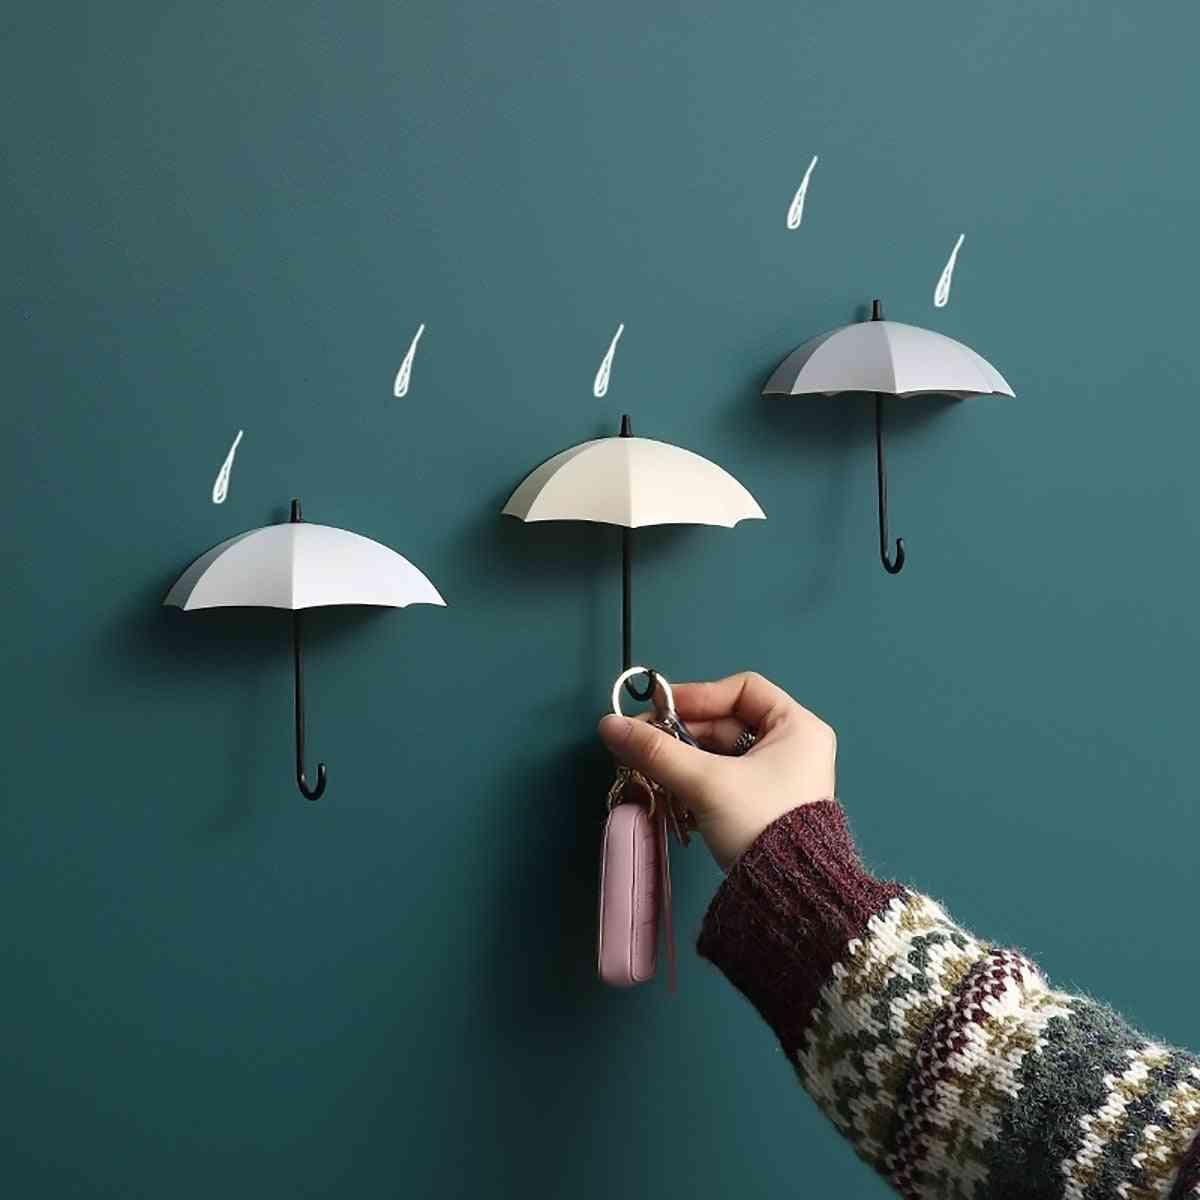 Creative Umbrella Shaped Storage Hook- Small Decorative Home Decor Wall Hook, Key Hair Pin Holder